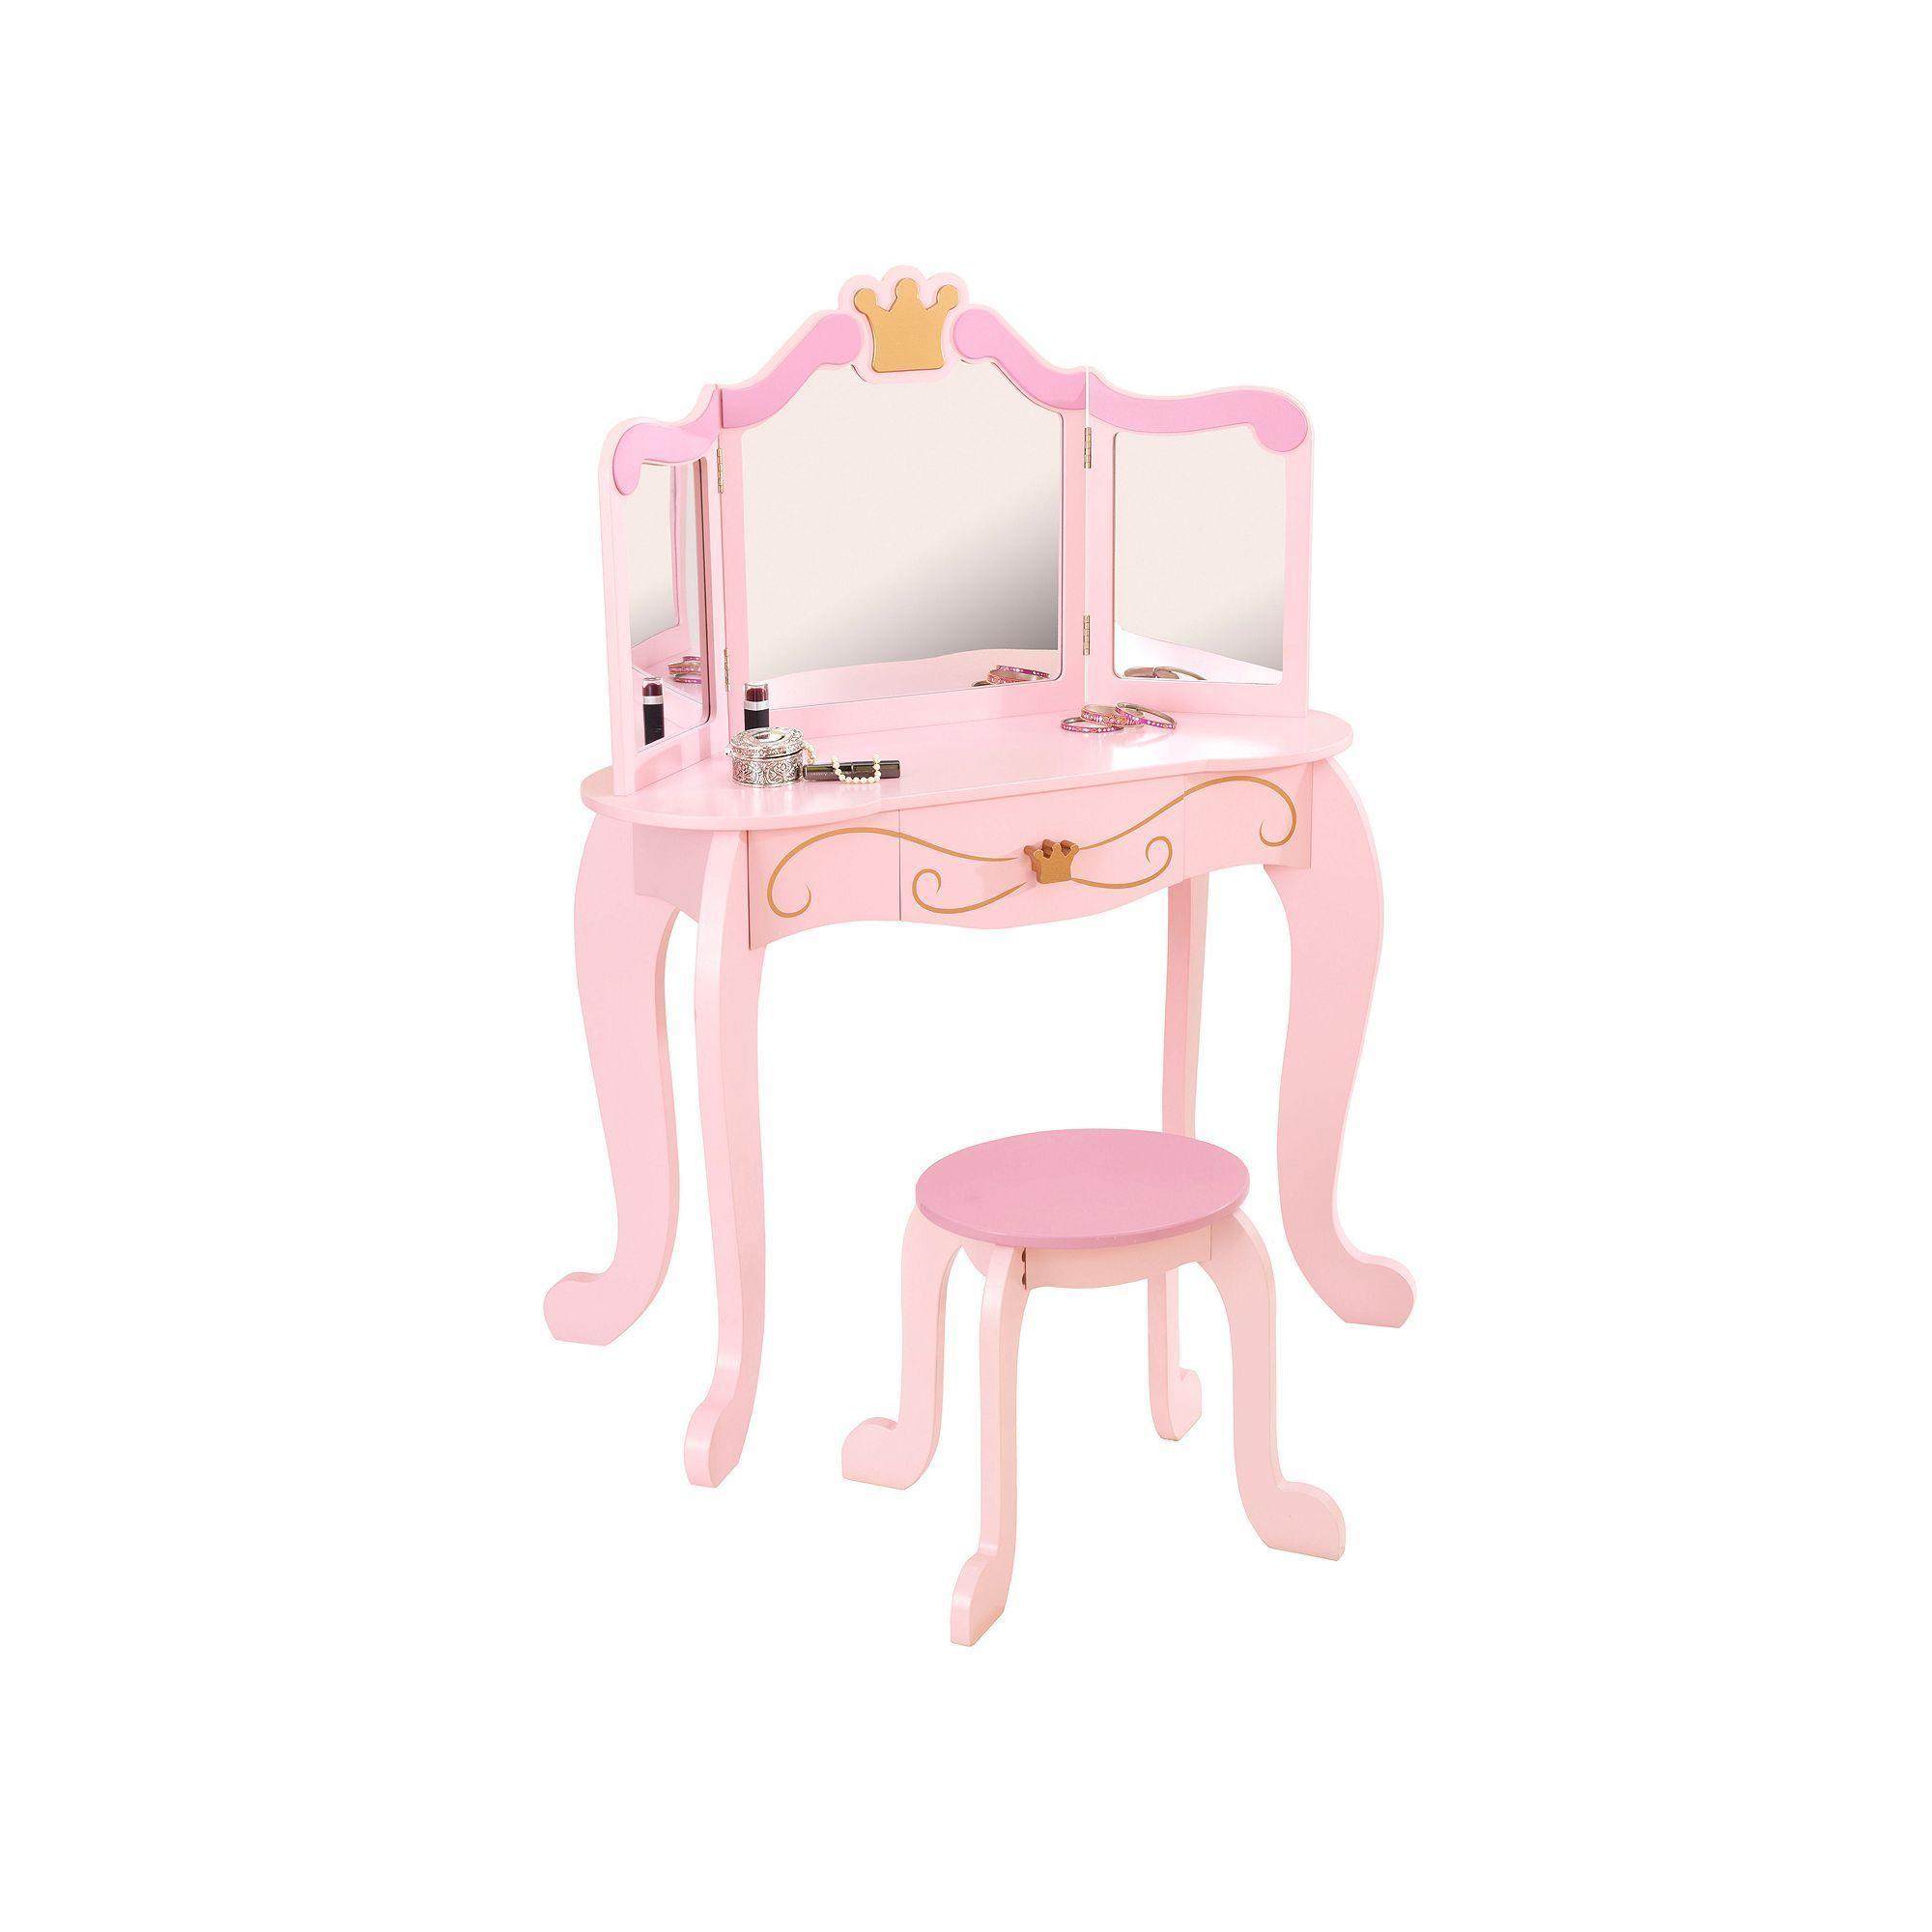 Kidkraft Princess Vanity Stool Set Girls Vanity Table Little